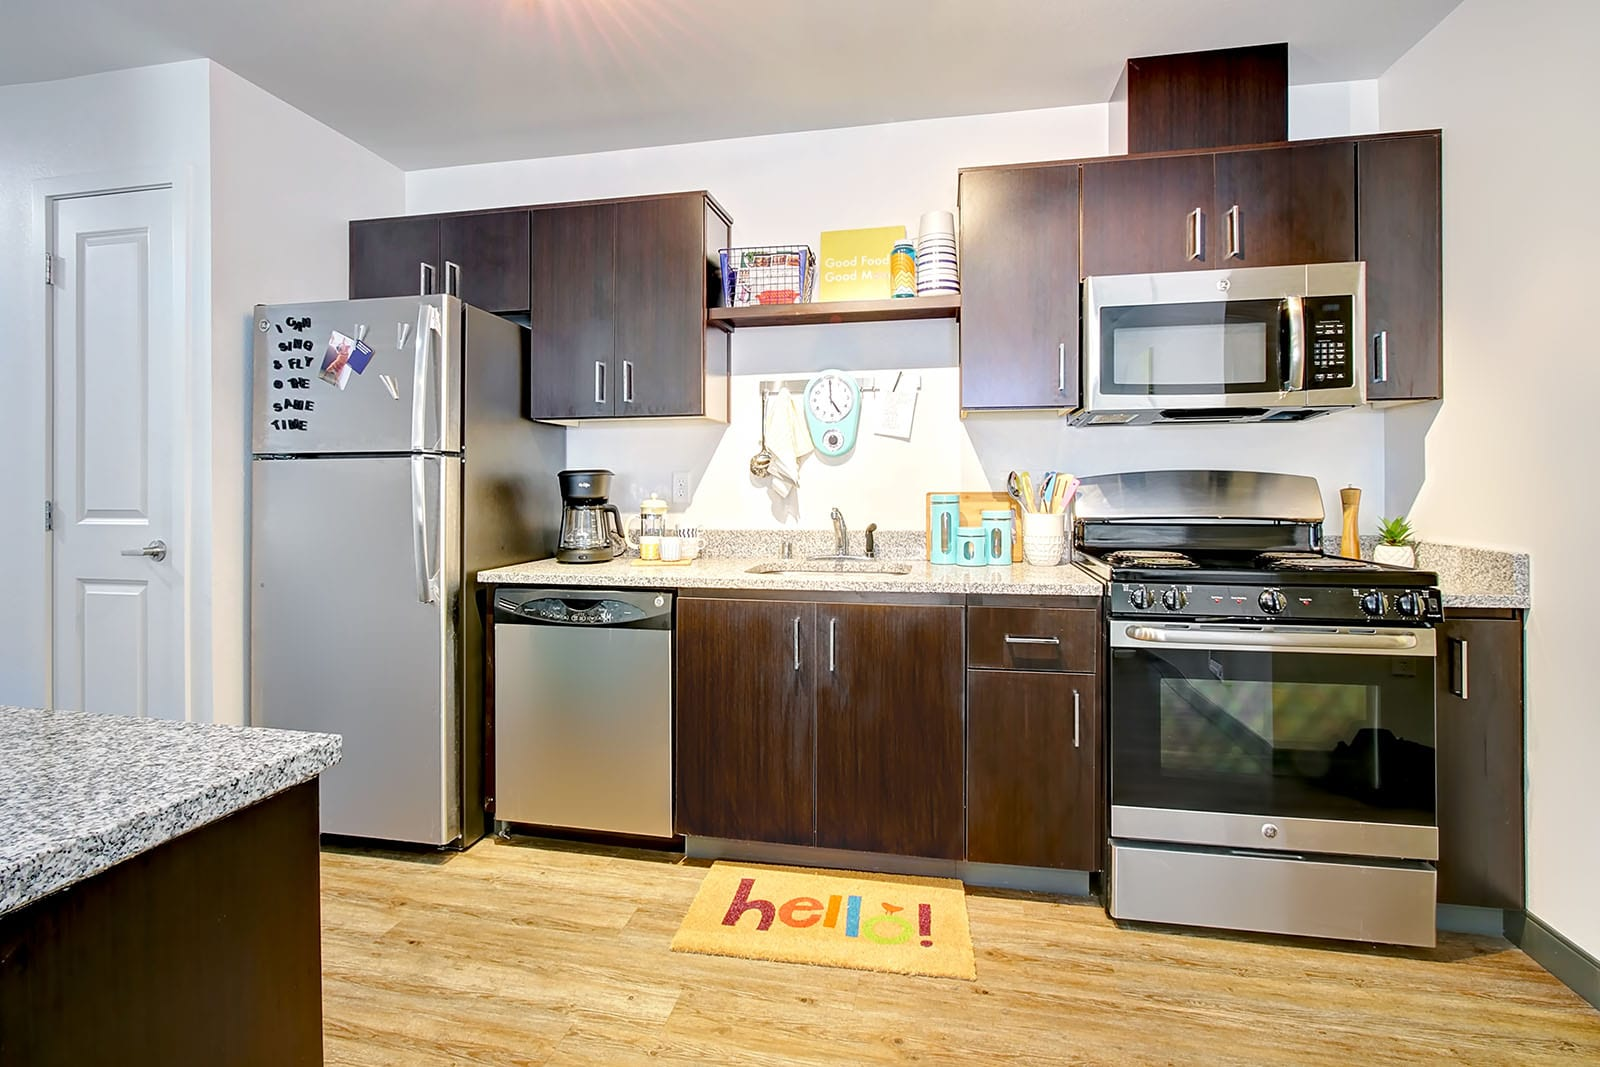 Student Housing in Bellingham, WA